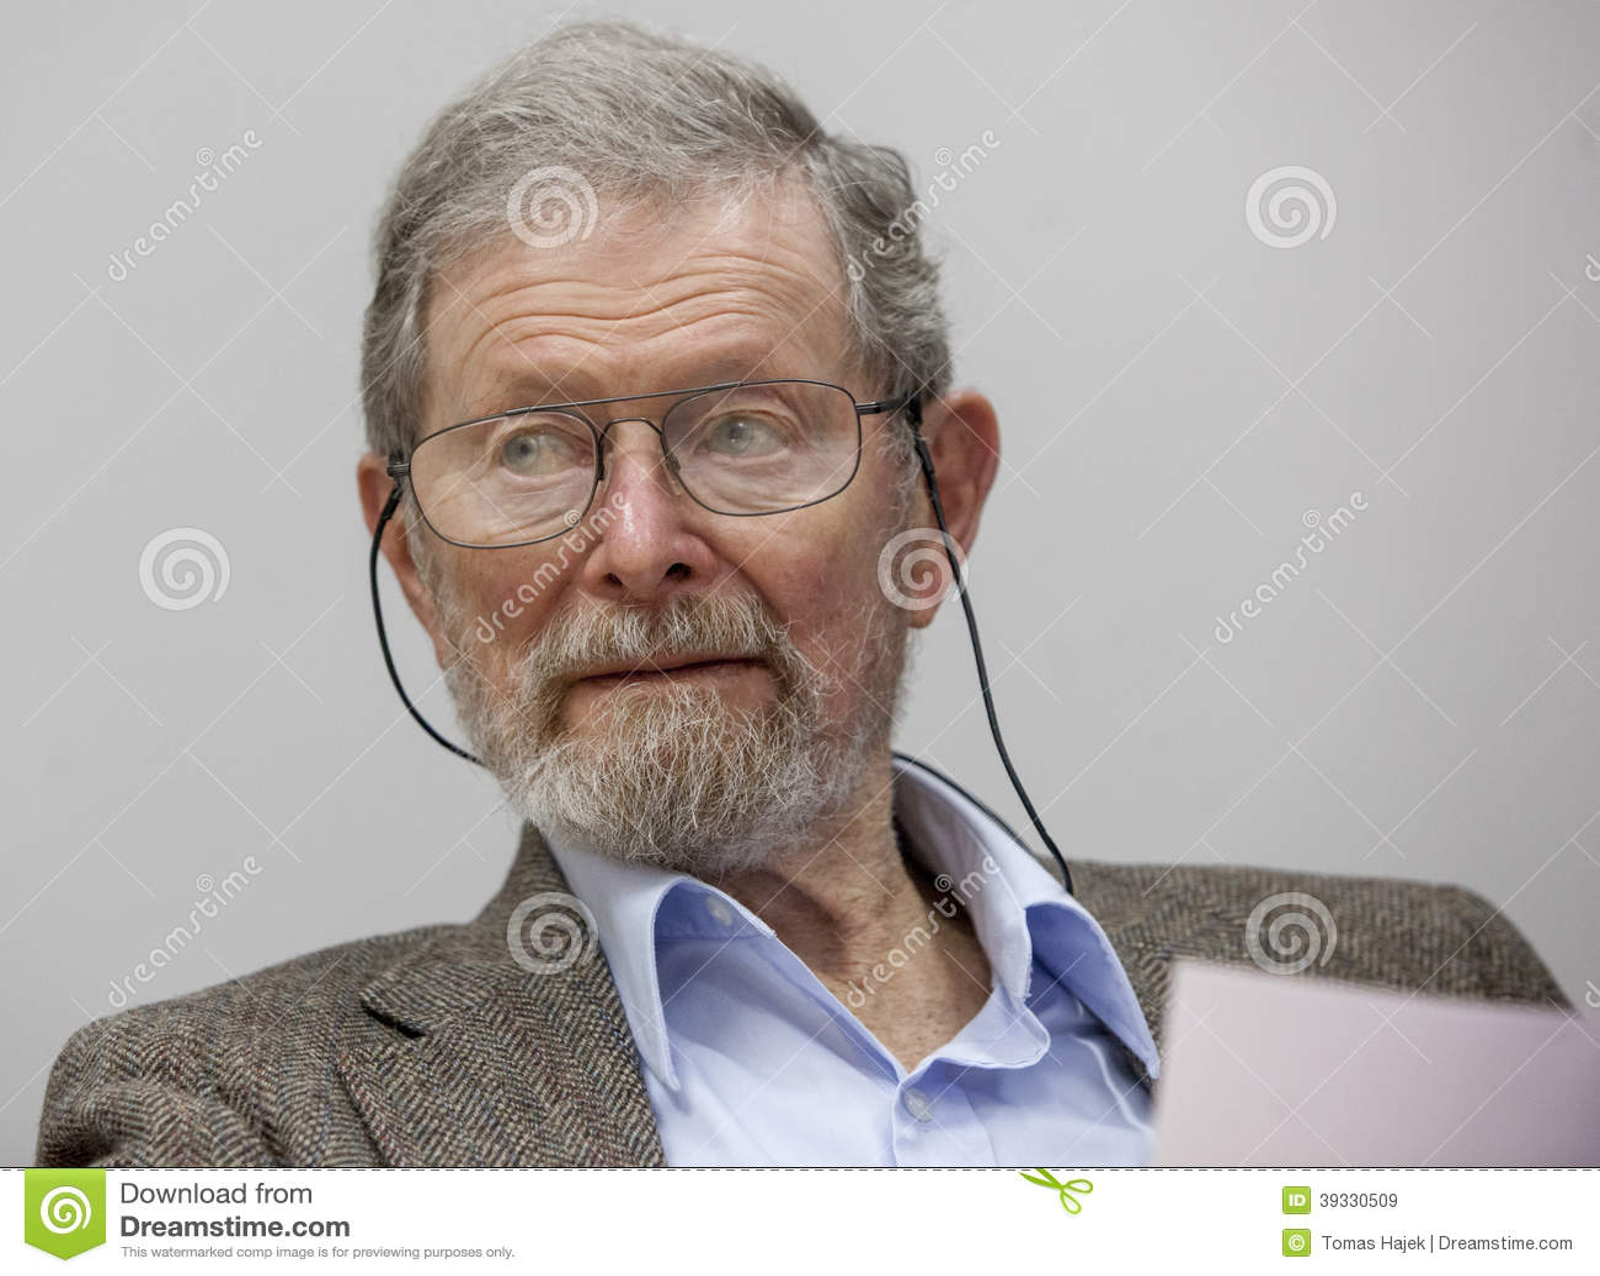 Nobel laureate professor Dr. George E. Smith